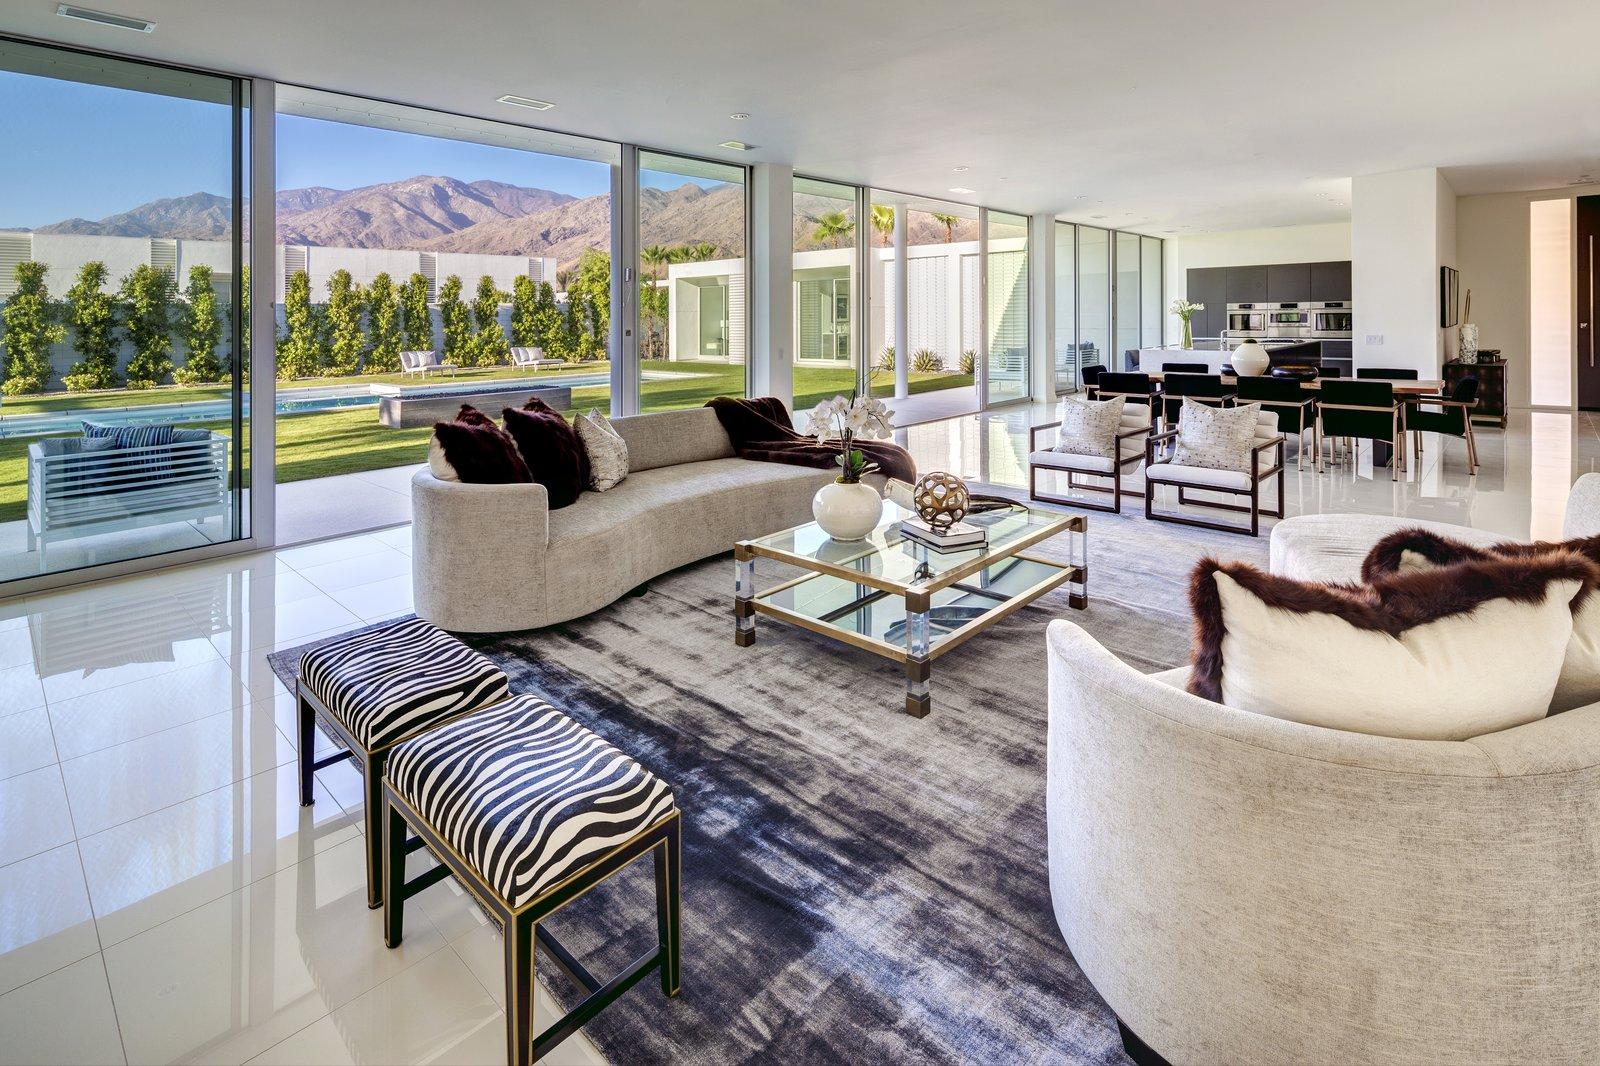 Living Room, Sofa, Coffee Tables, Chair, and Rug Floor  Linea Residence